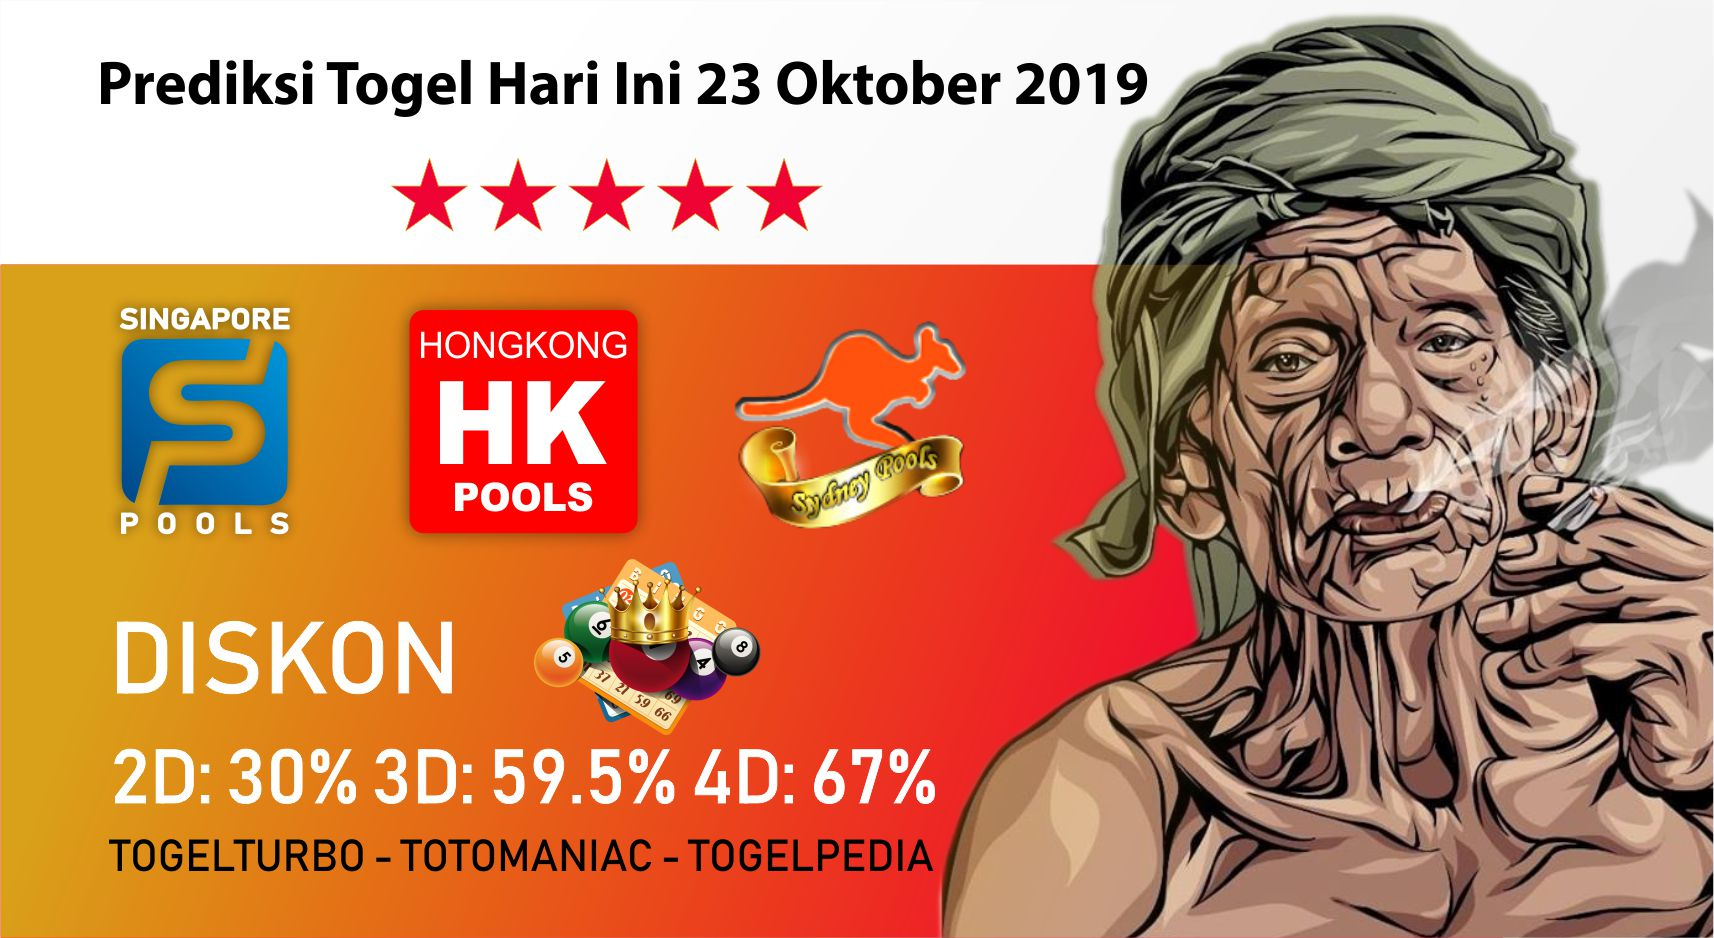 Prediksi Togel Hari Ini 23 Oktober 2019 Prediksiangka